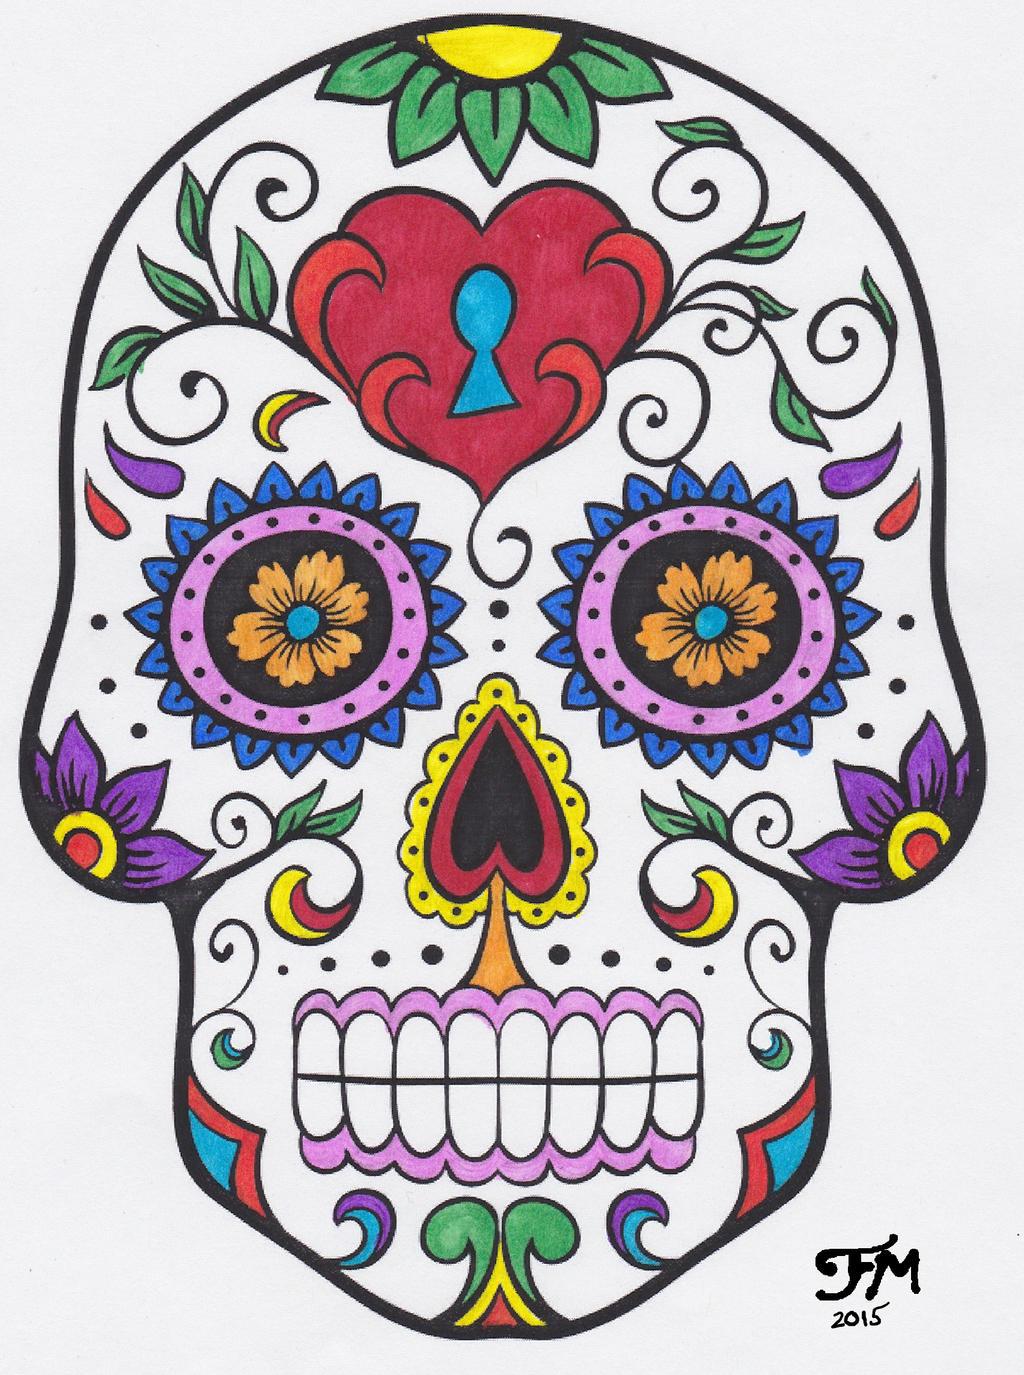 How To Write A Letter On Dia De Los Muertos